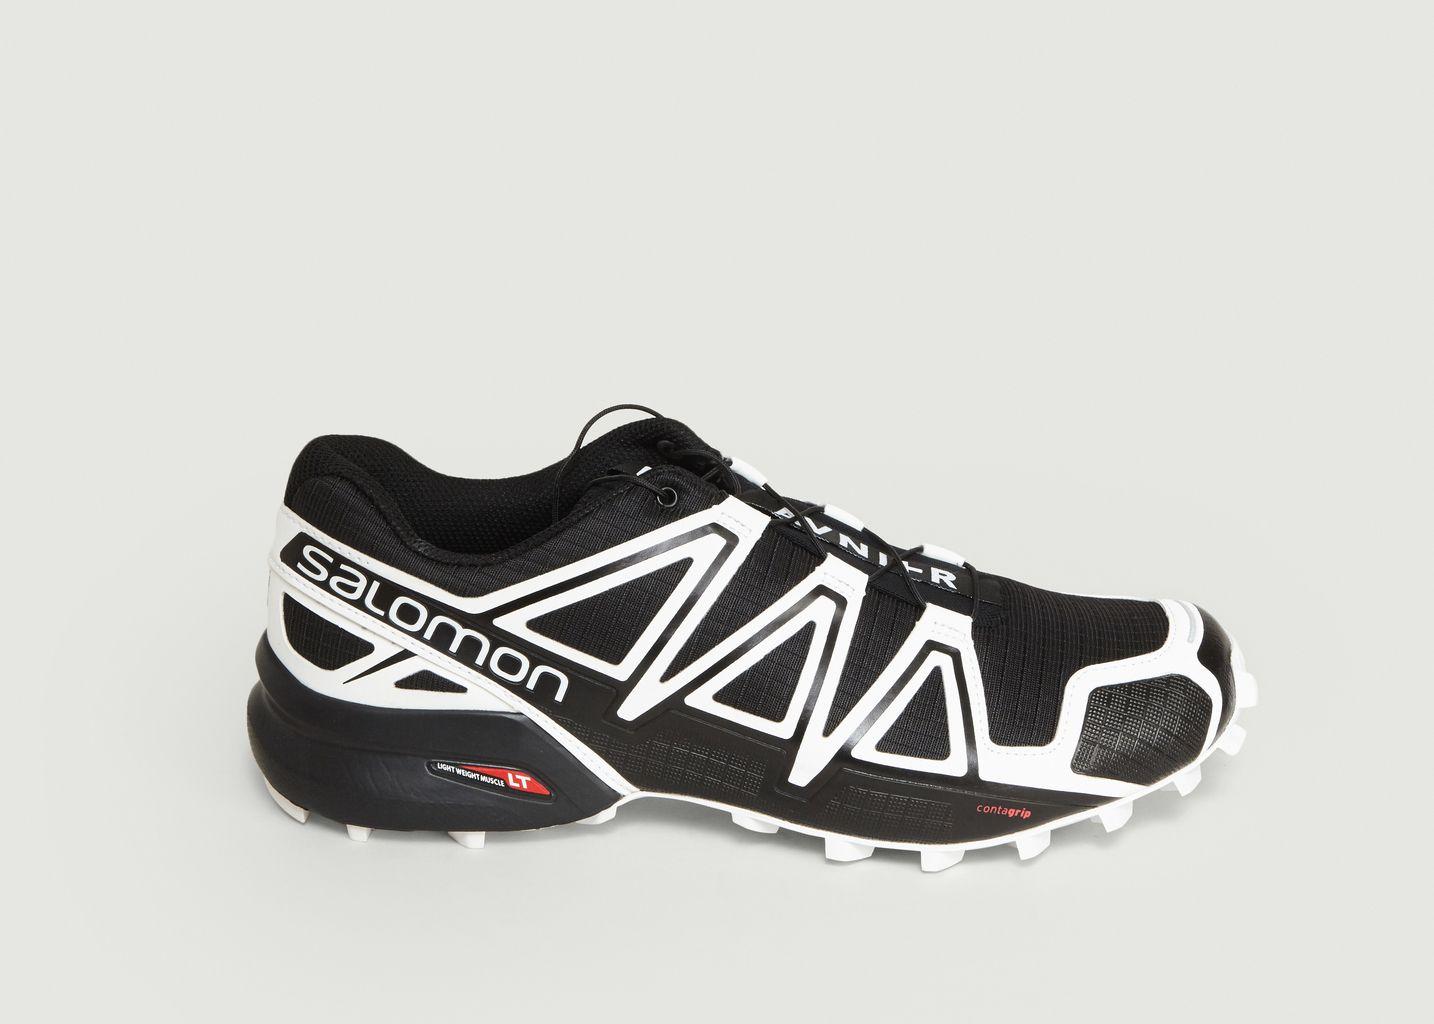 701666a0c4b3 Sneakers Speedcross 4 AVNIER x Salomon Noir AVNIER